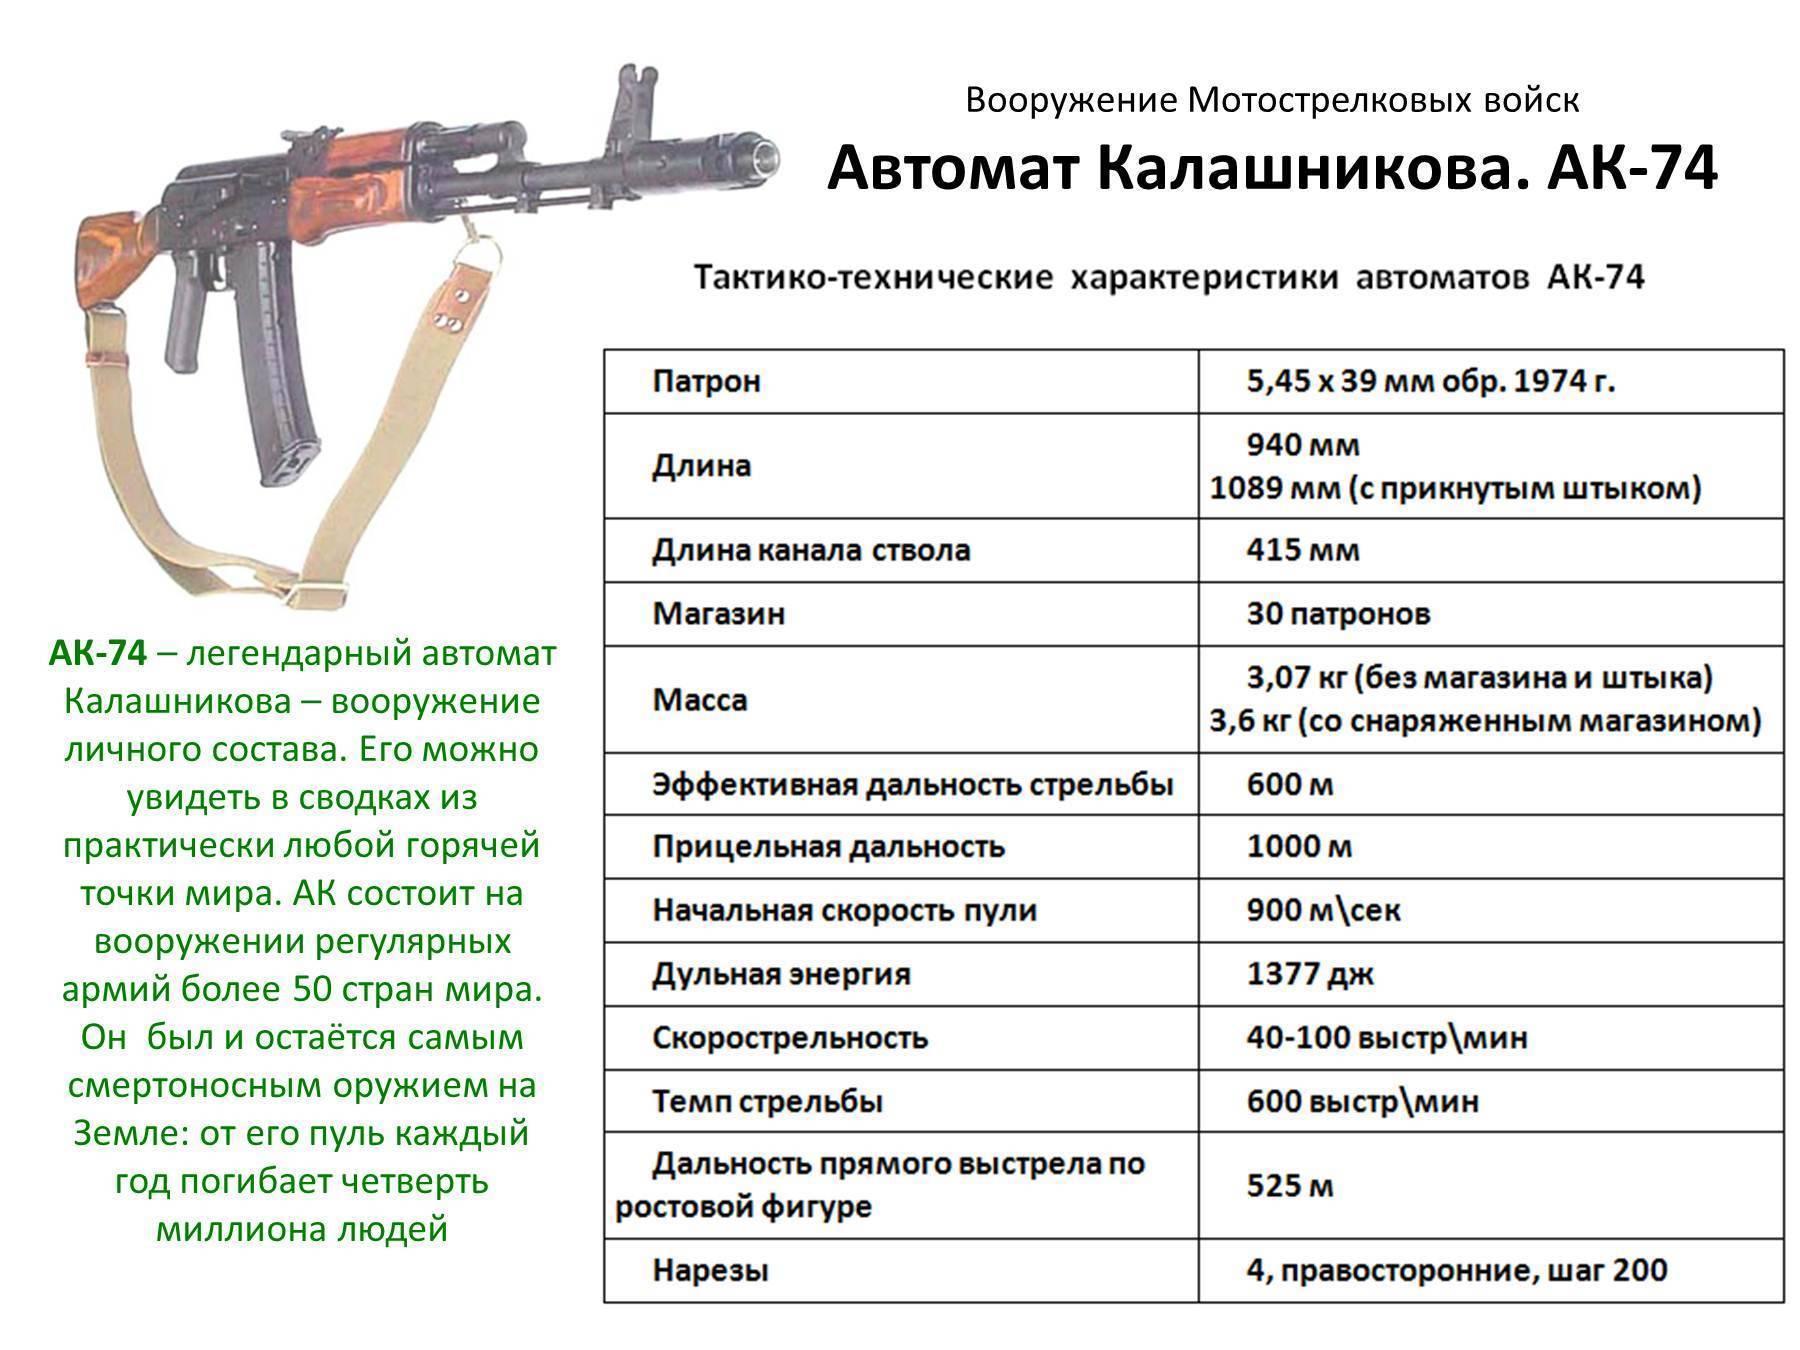 Видео: автомат калашникова акс-74у